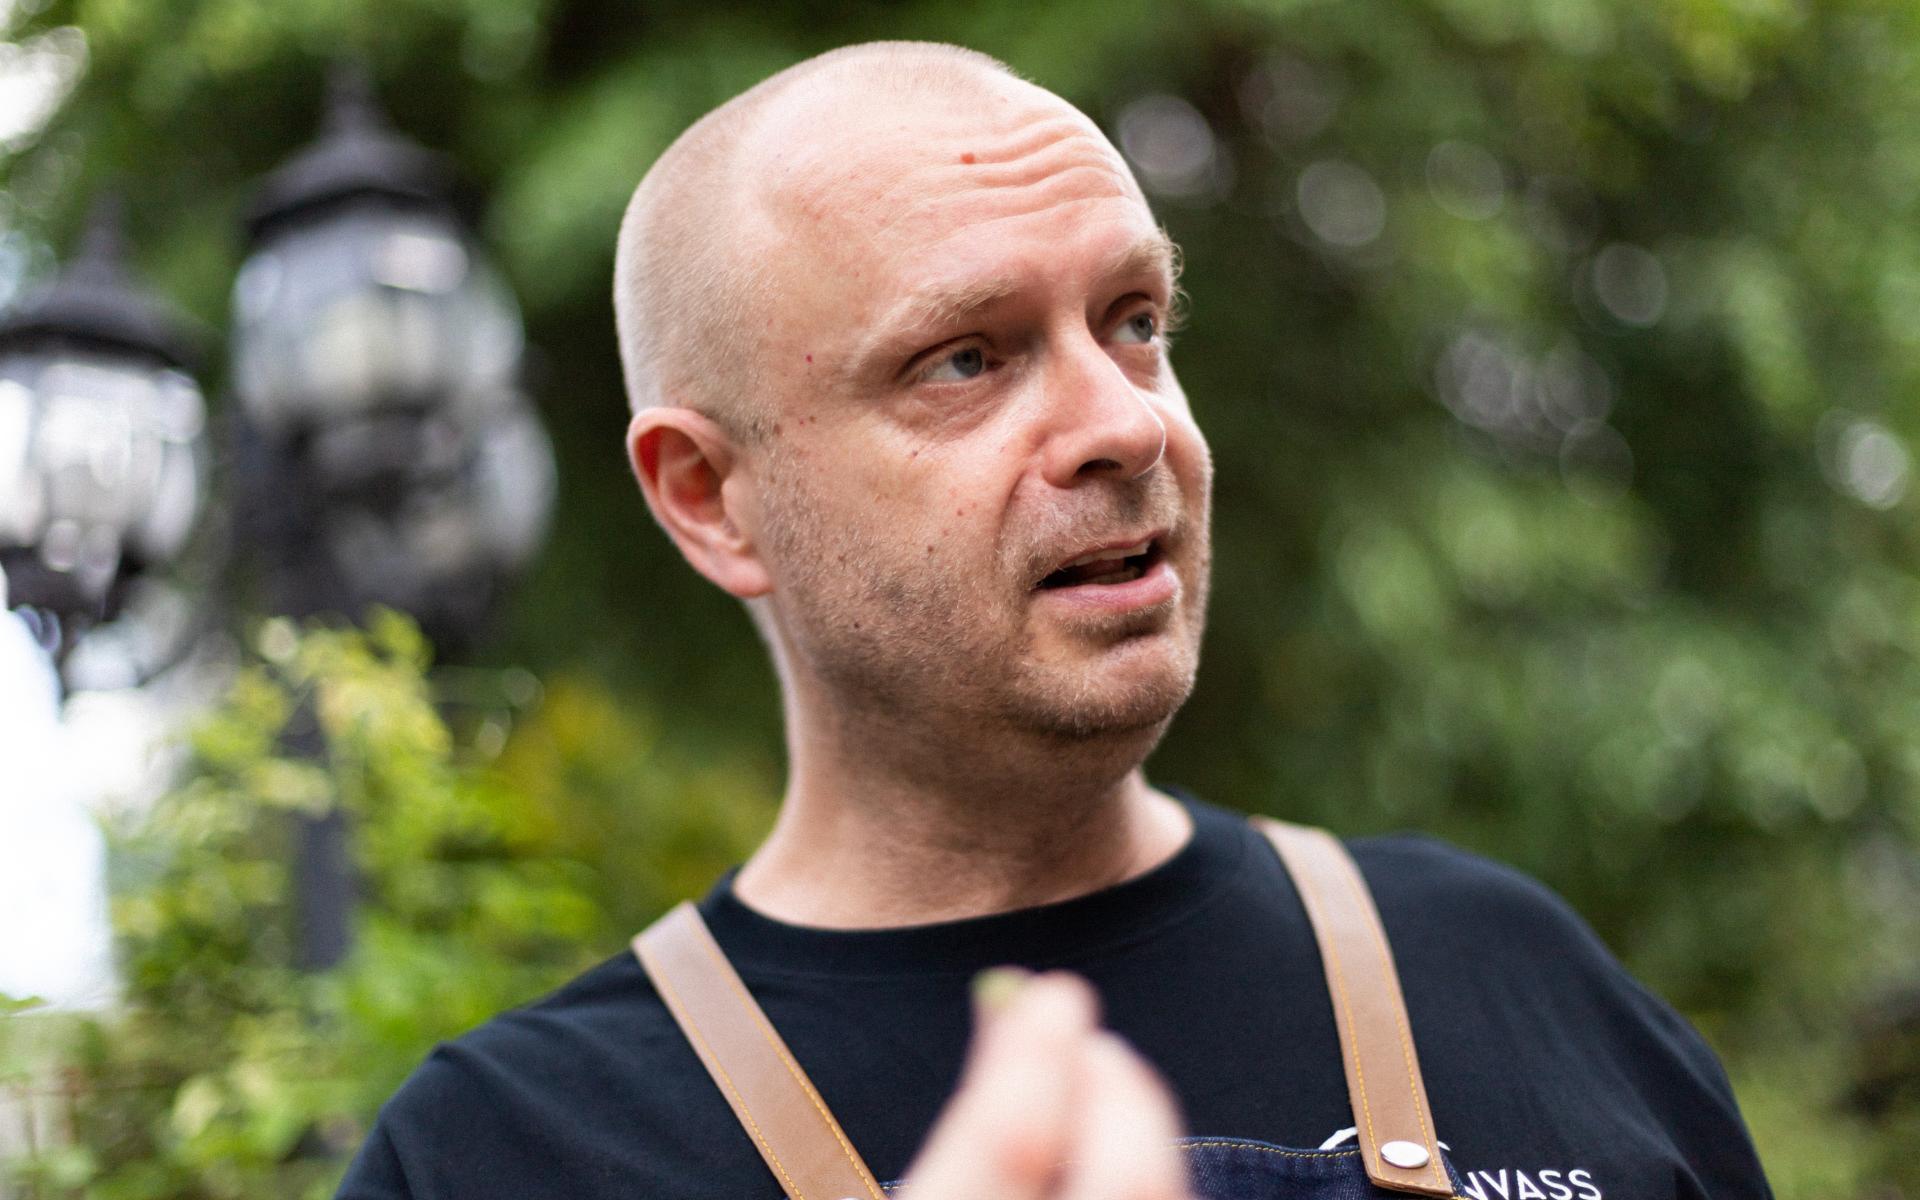 Sustainable Sunday: Chef Nikolaj Lenz On Being Eco-Conscious Outside The Kitchen